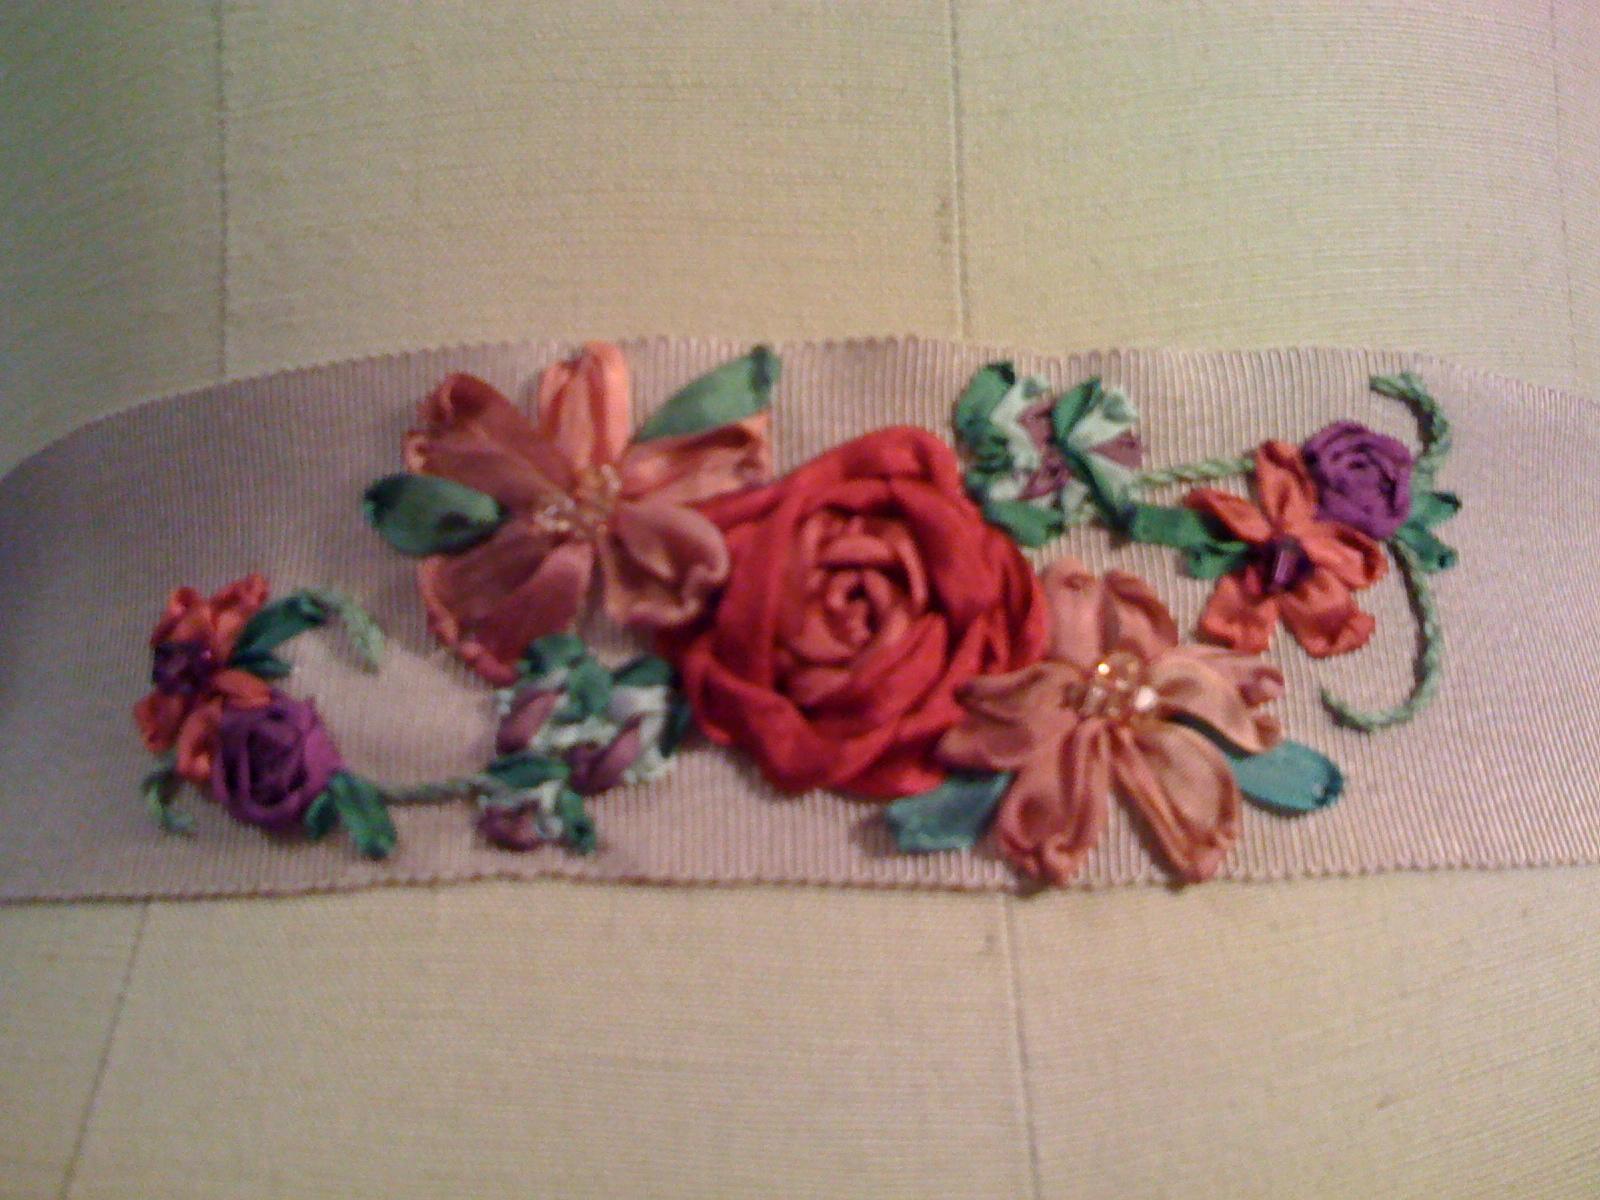 Lily bride designs silk ribbon embroidery